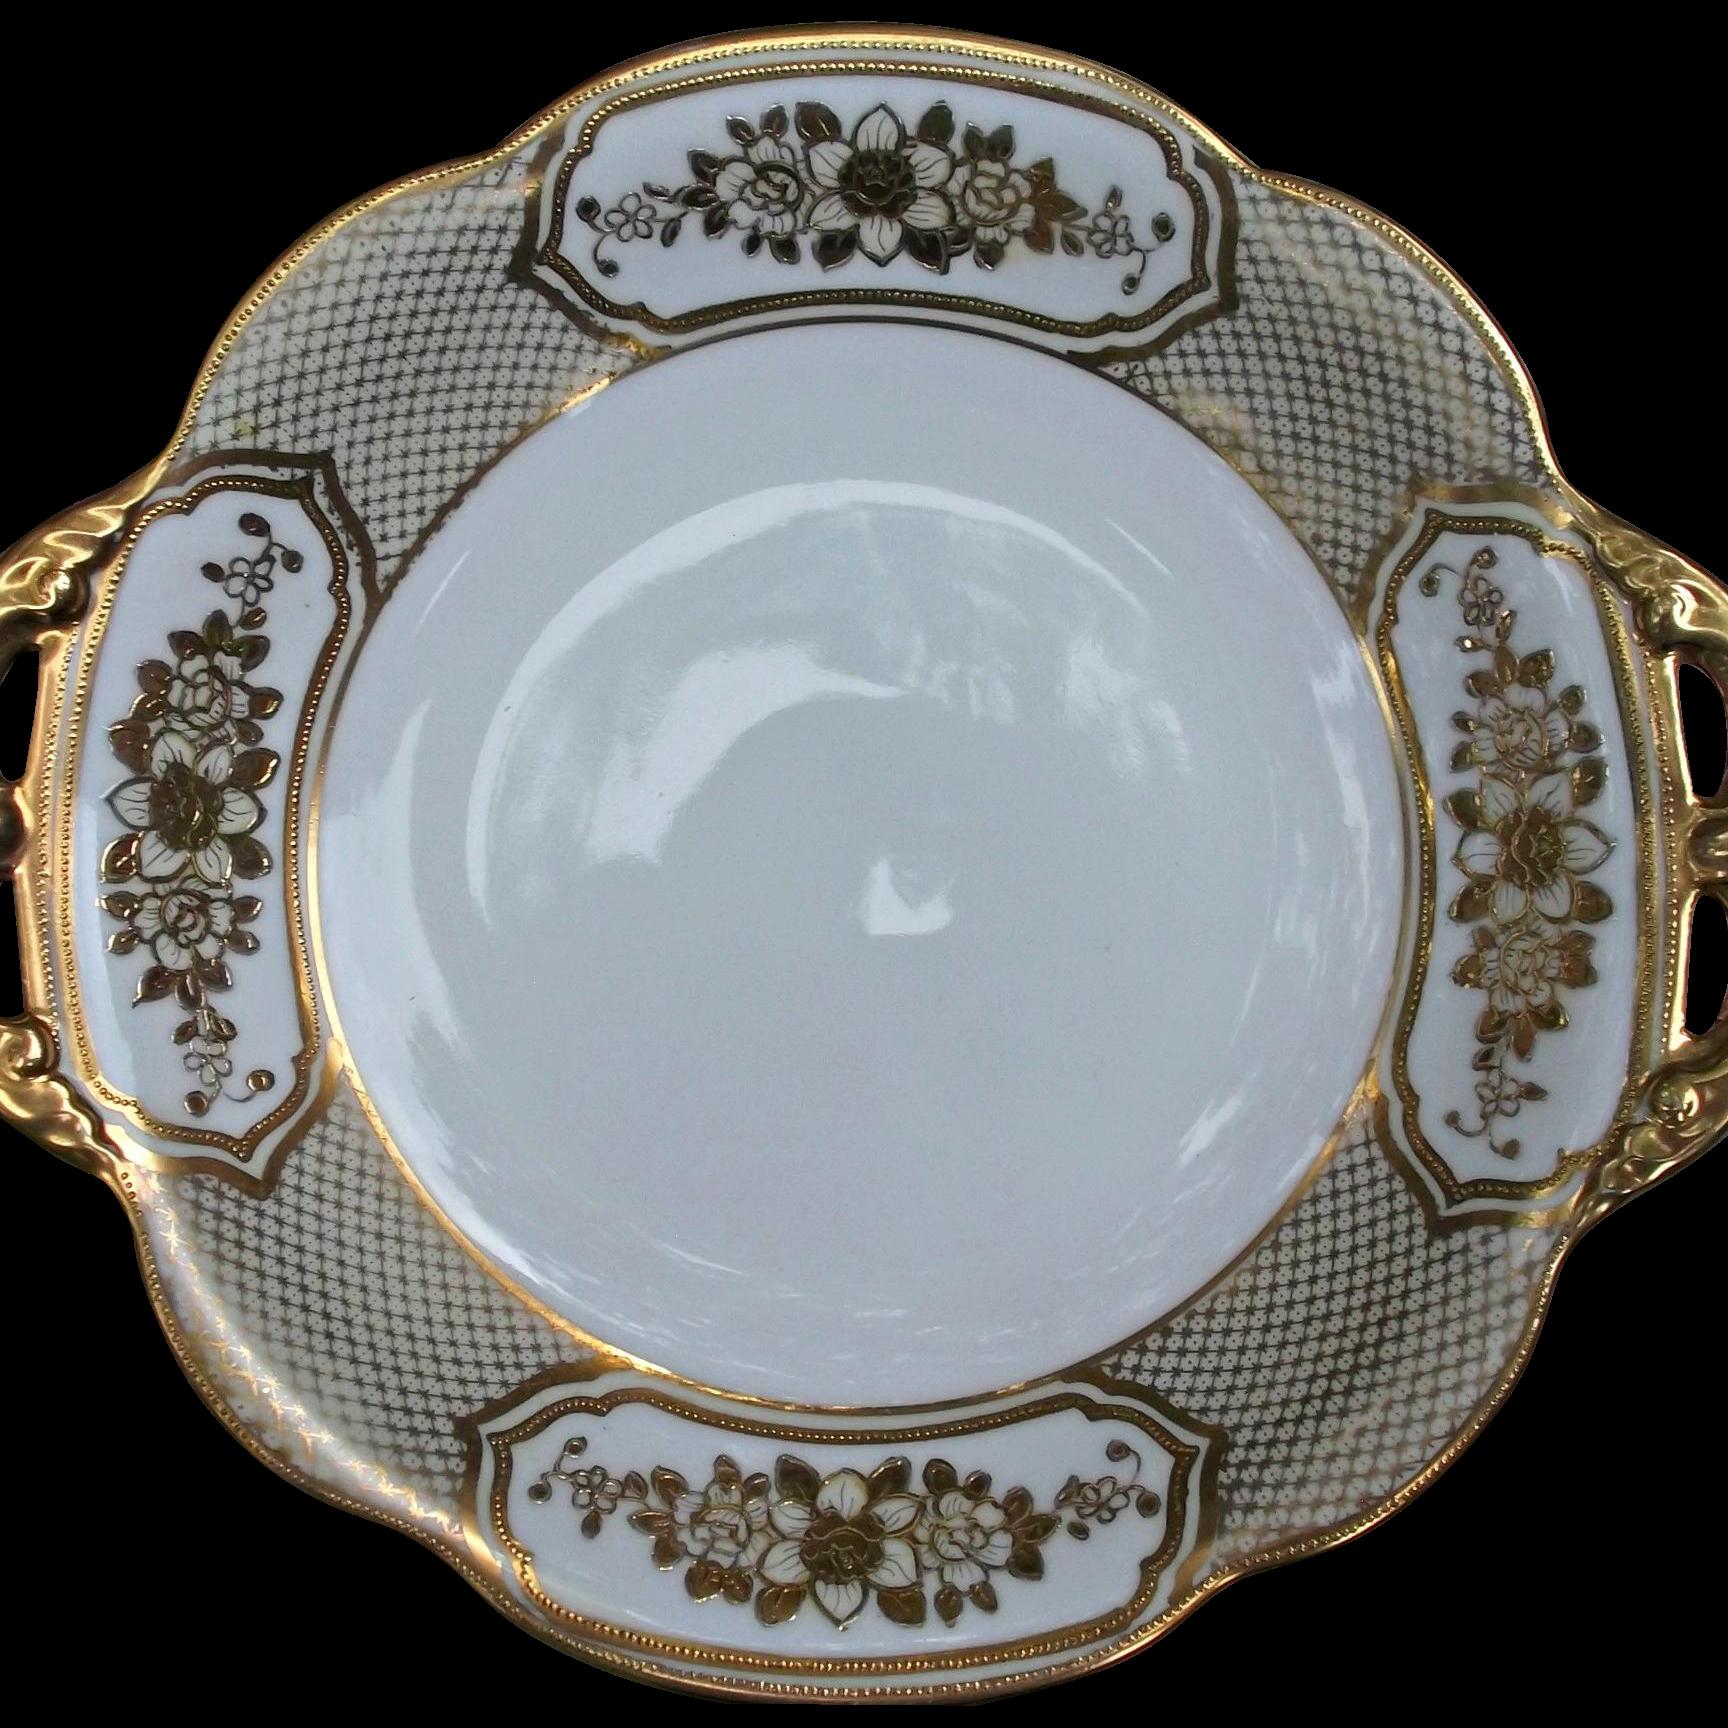 Noritake Vintage Handled Serving Bowl Gold Gilt Flowers Beads